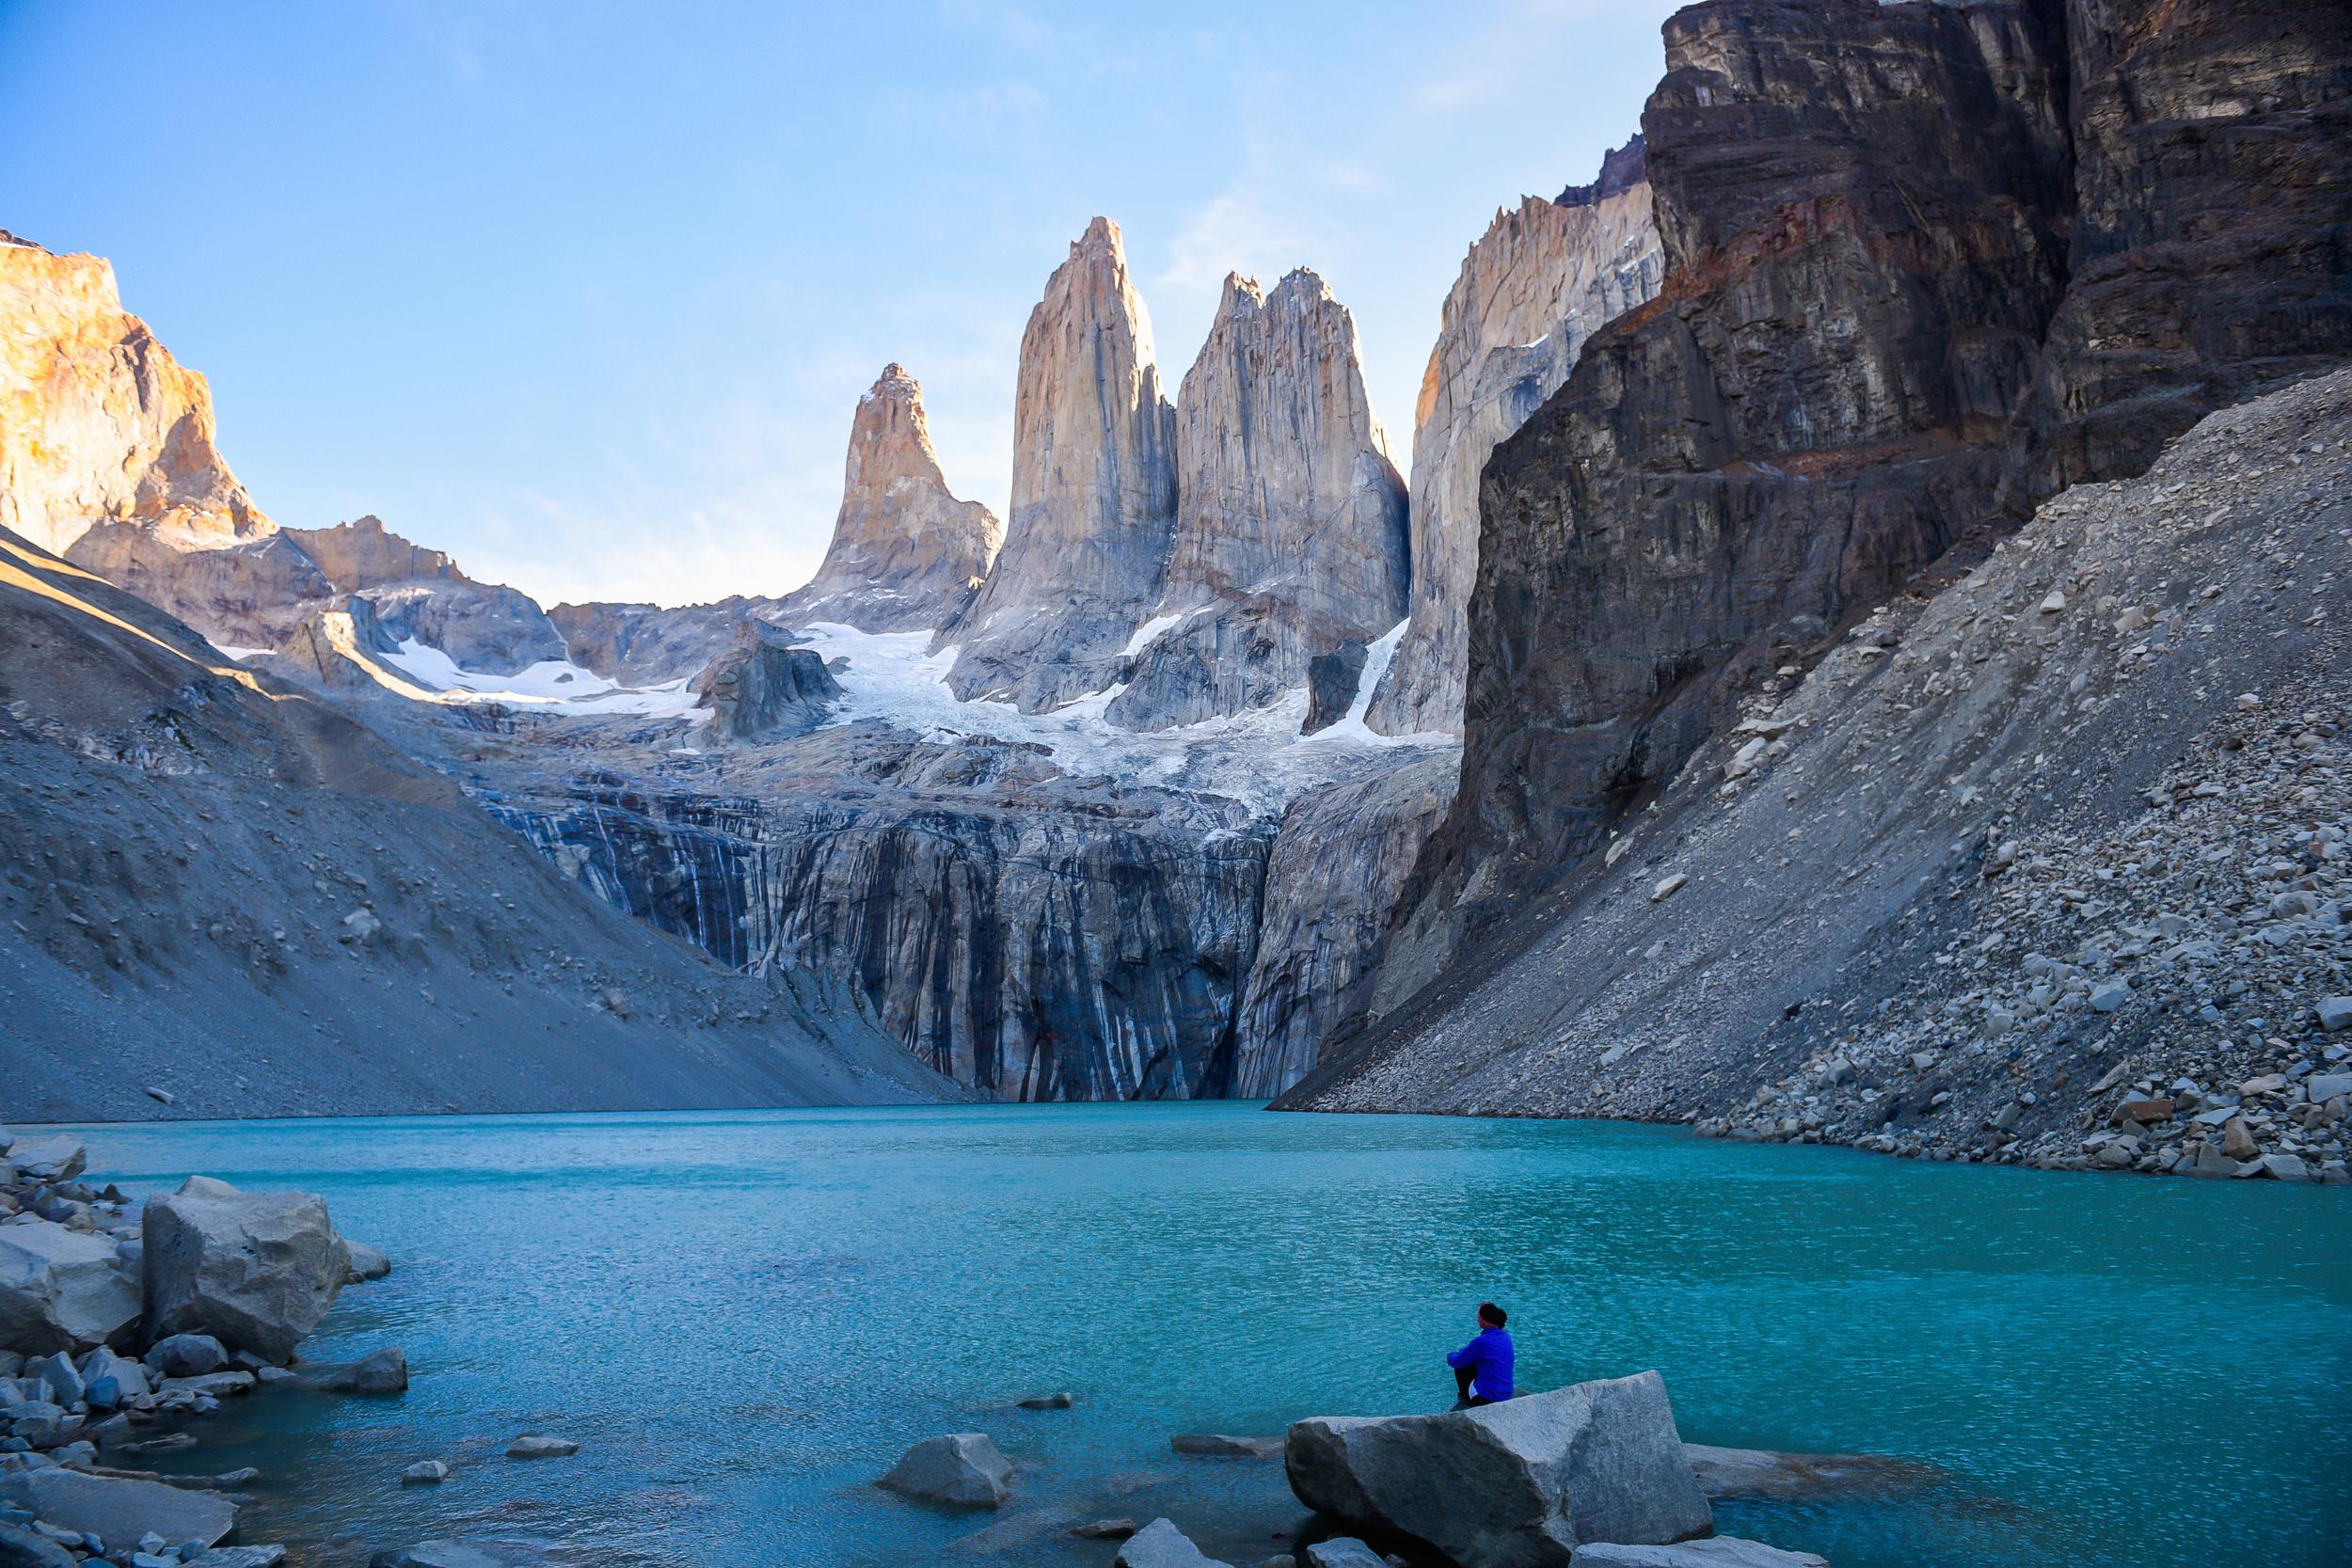 patagonia-11_26659997975_o.jpg